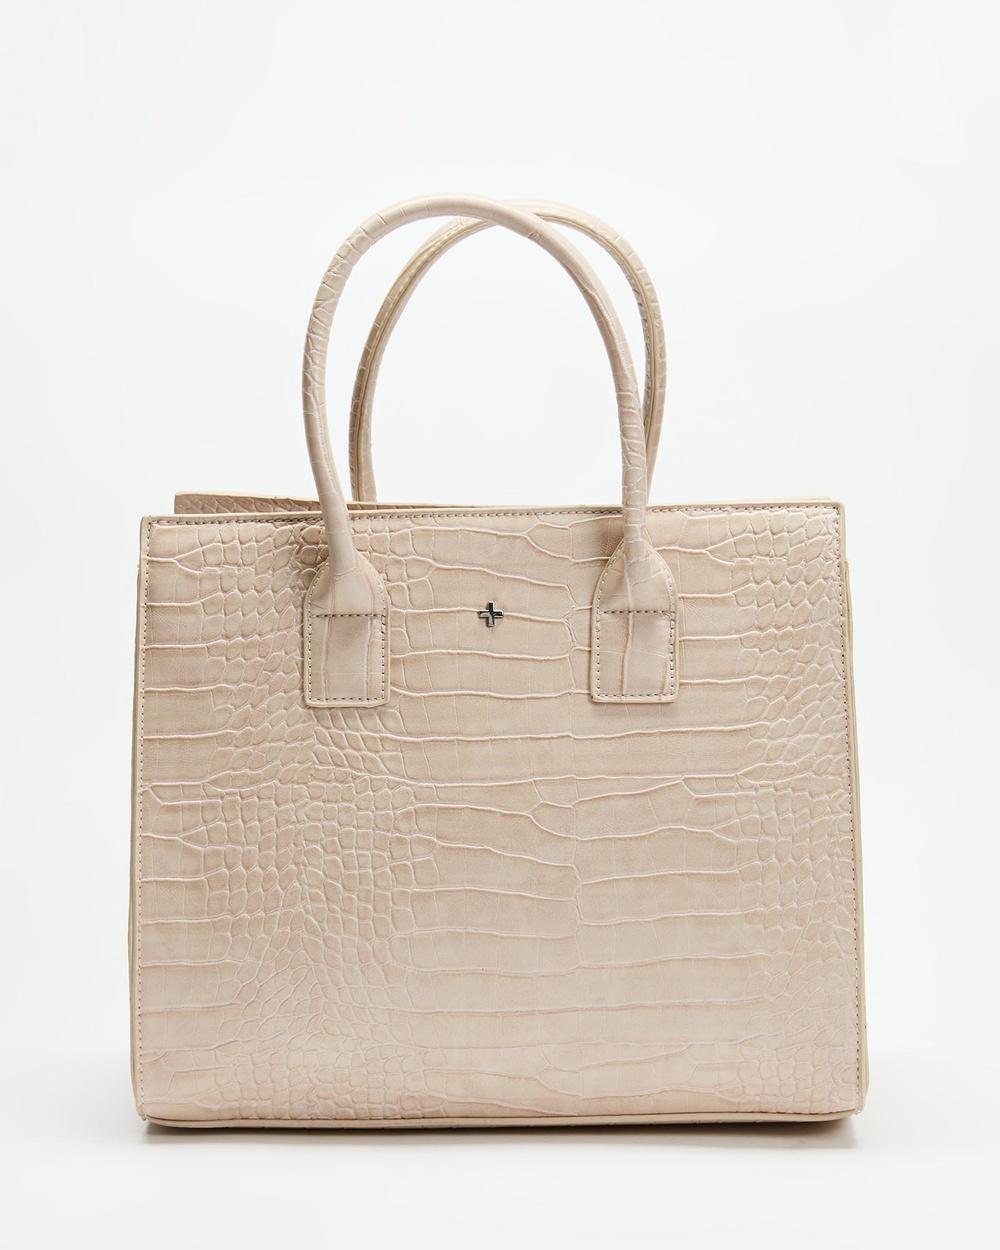 PETA AND JAIN Valentine Tote Bag Handbags Nude